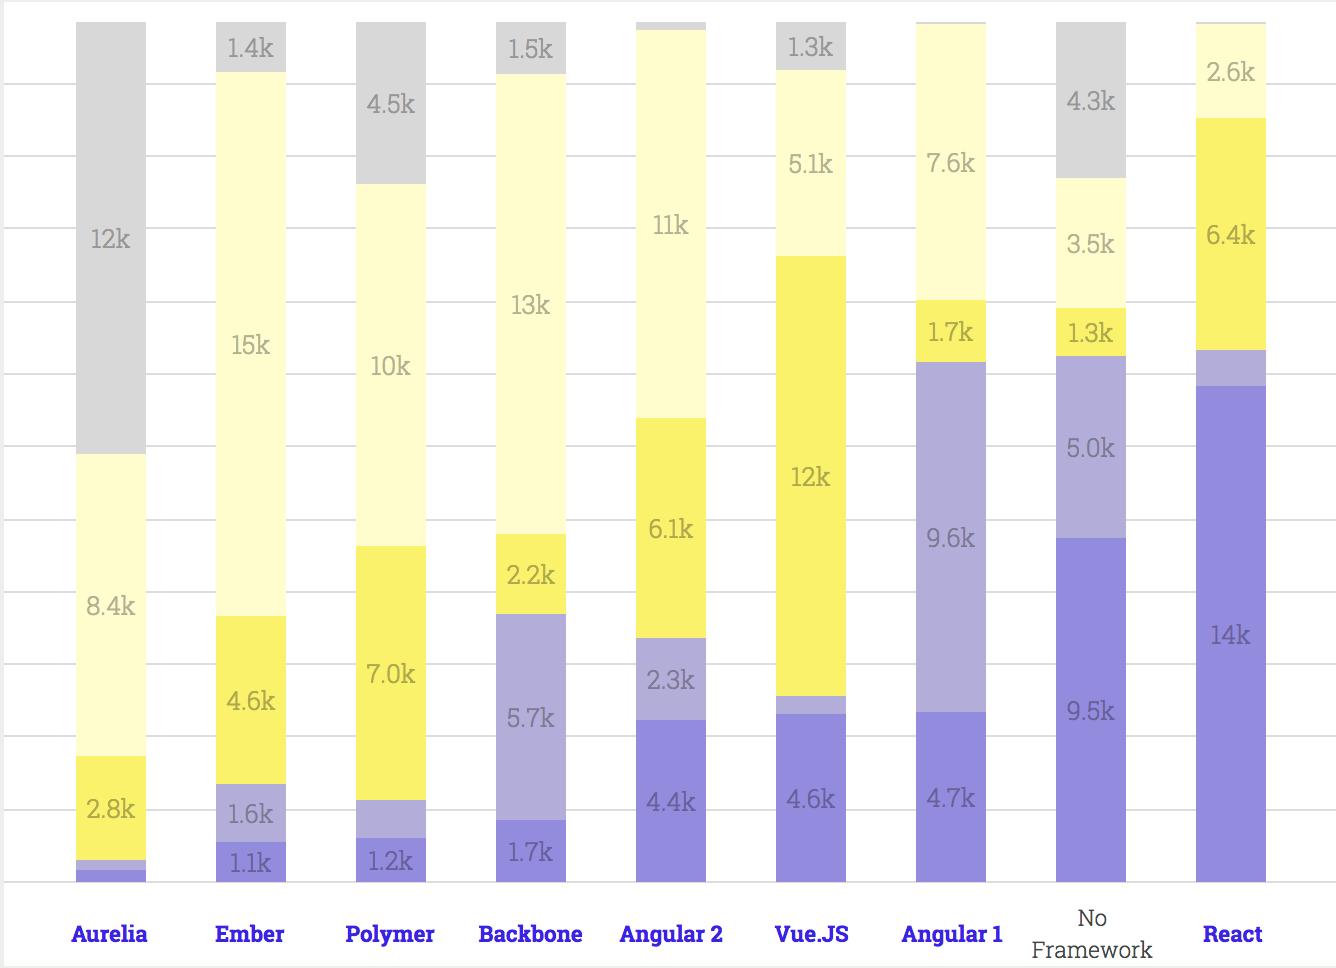 Оценка популярности фреймворков